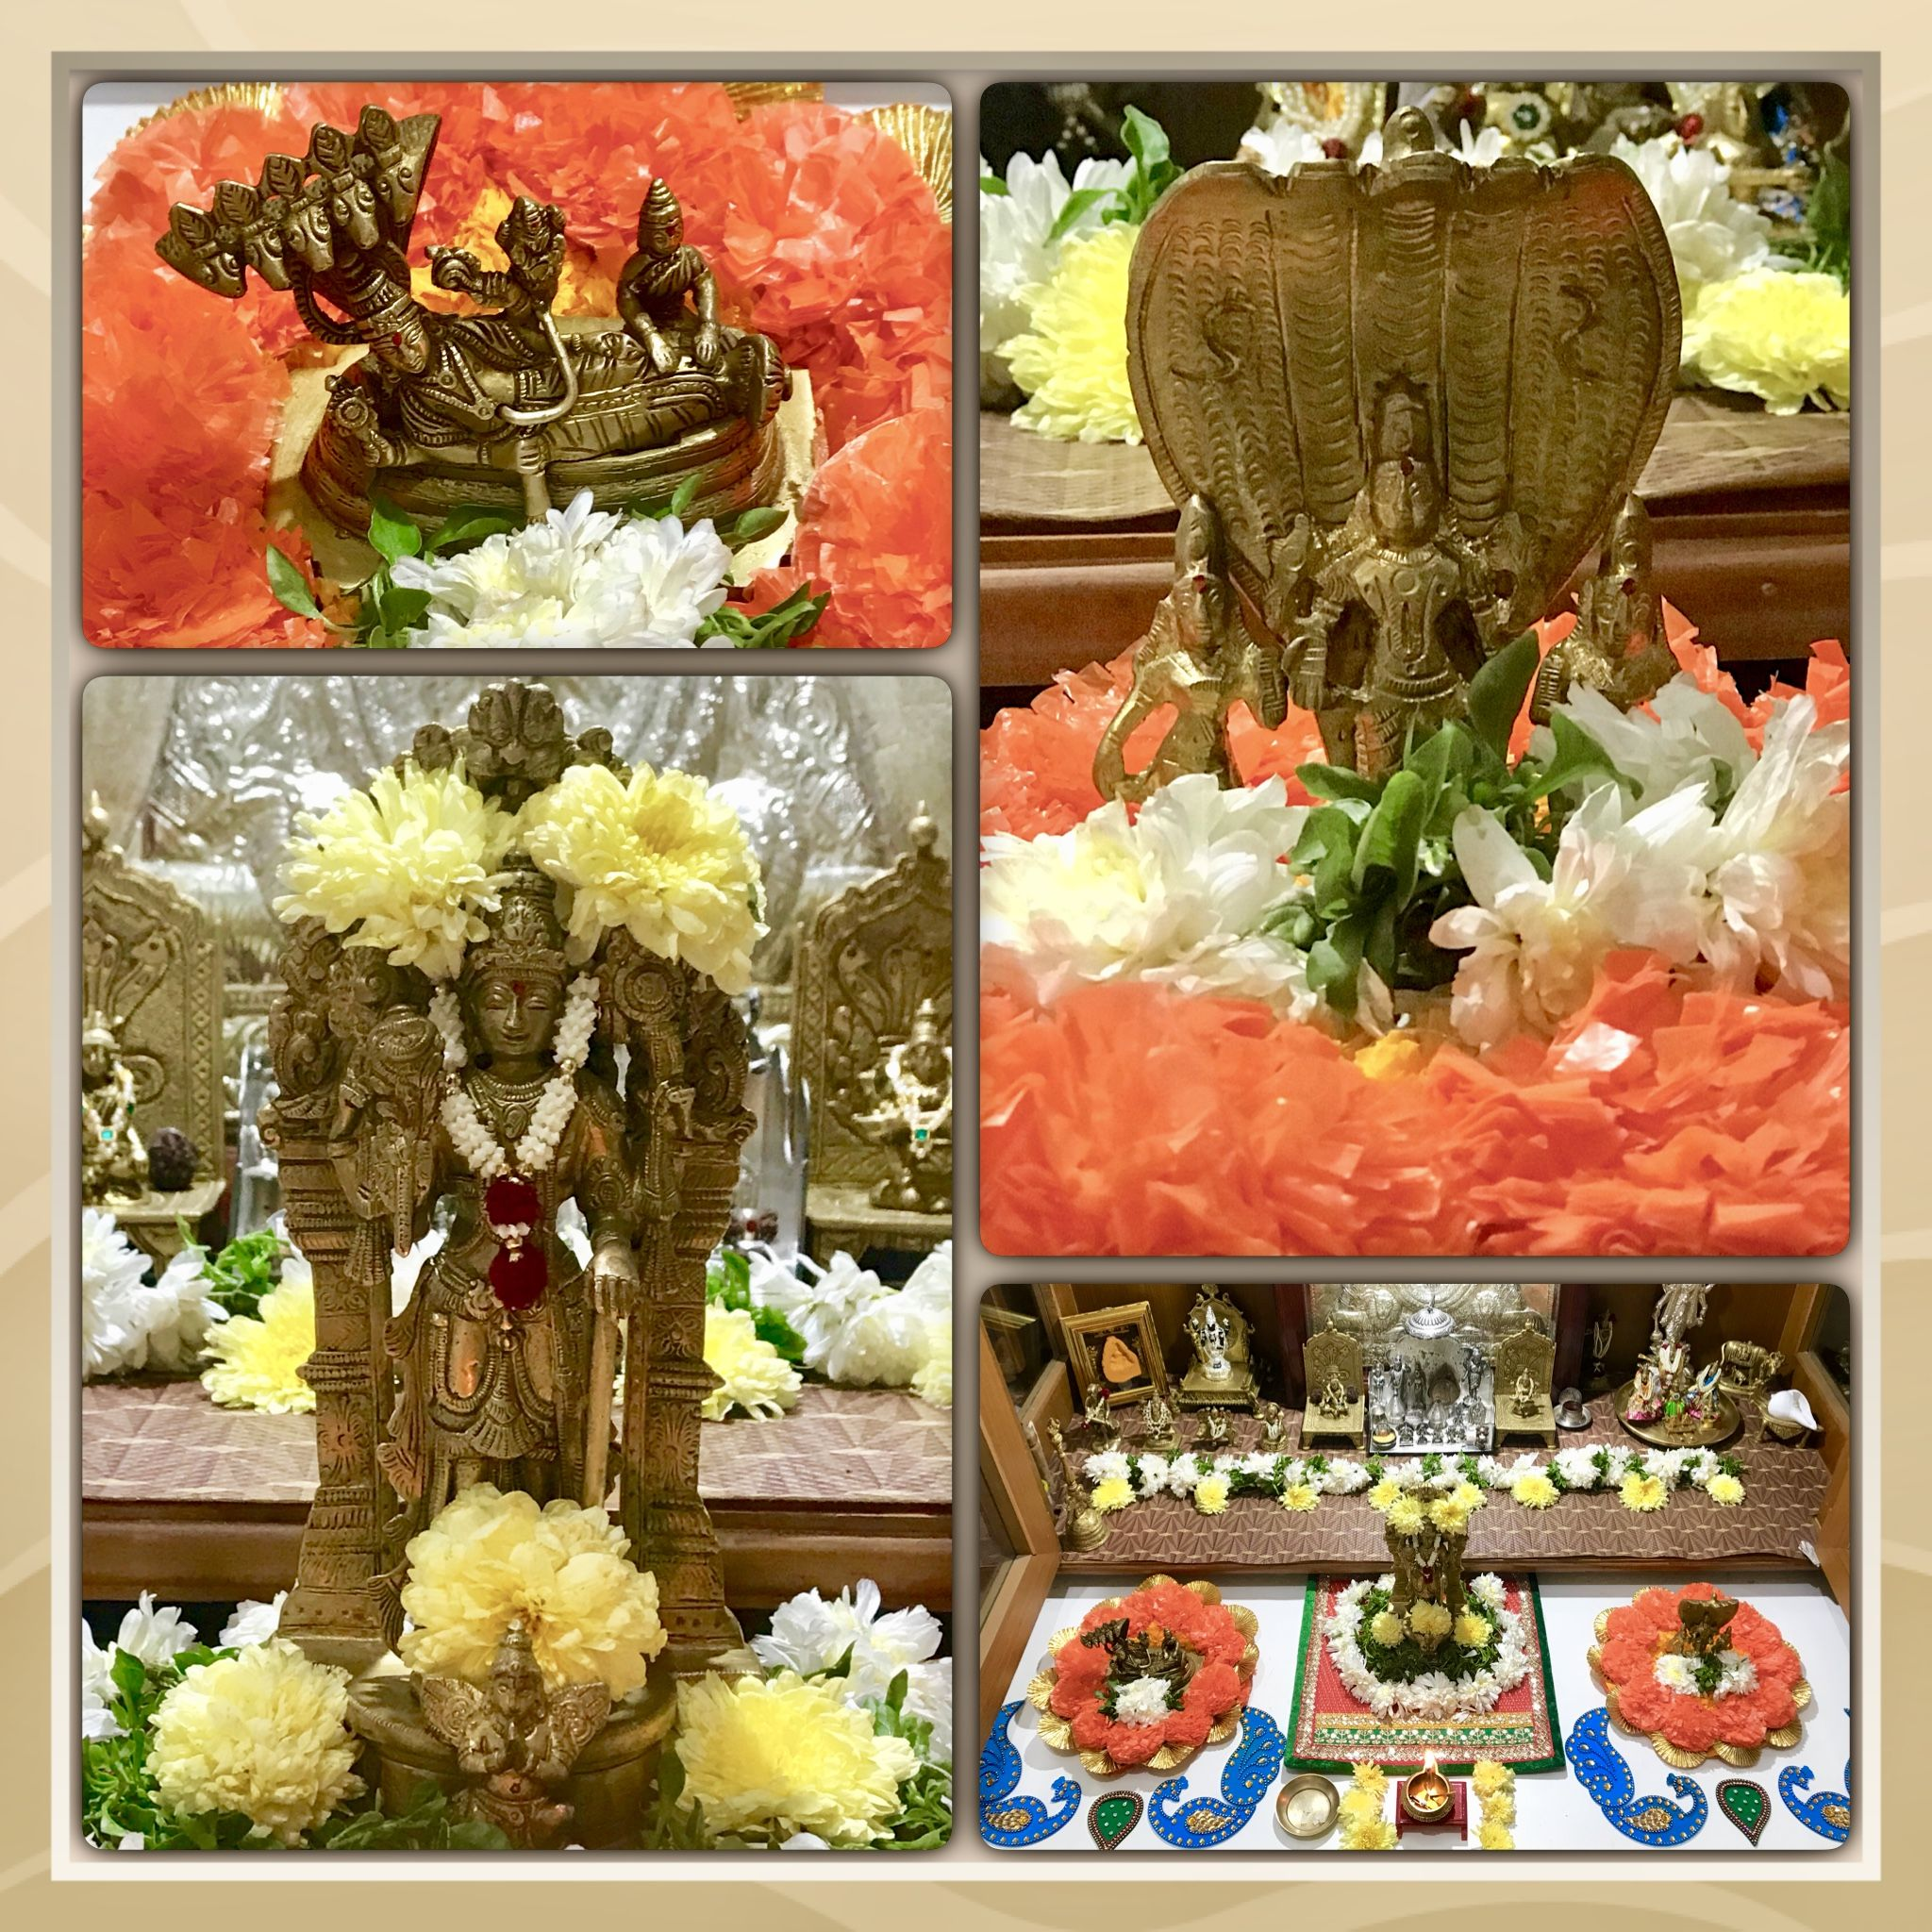 Pin by Radhika Naresh on Hindhu deities and pooja ...